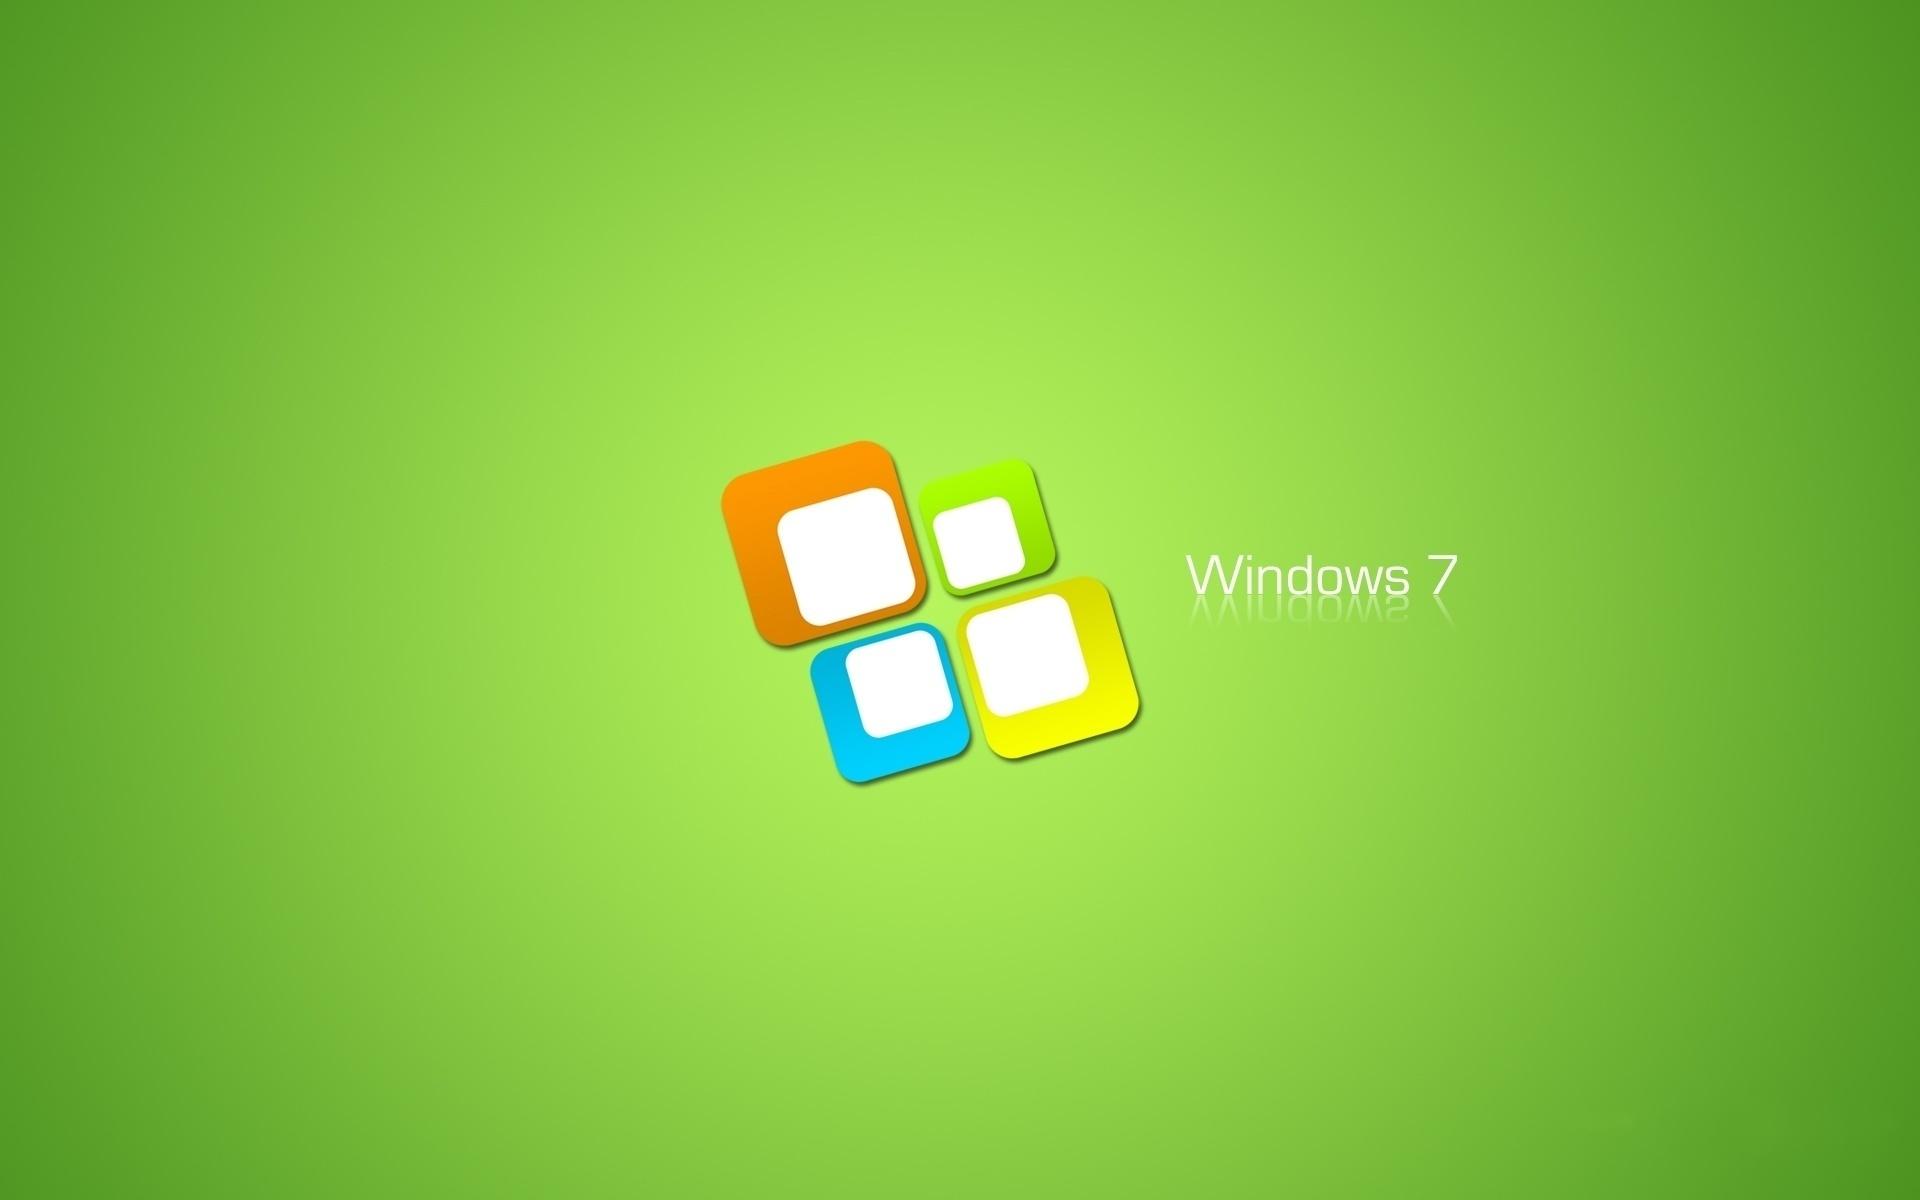 pc microsoft logo logo Windows widescreen 1920x1200 Windows 1920x1200